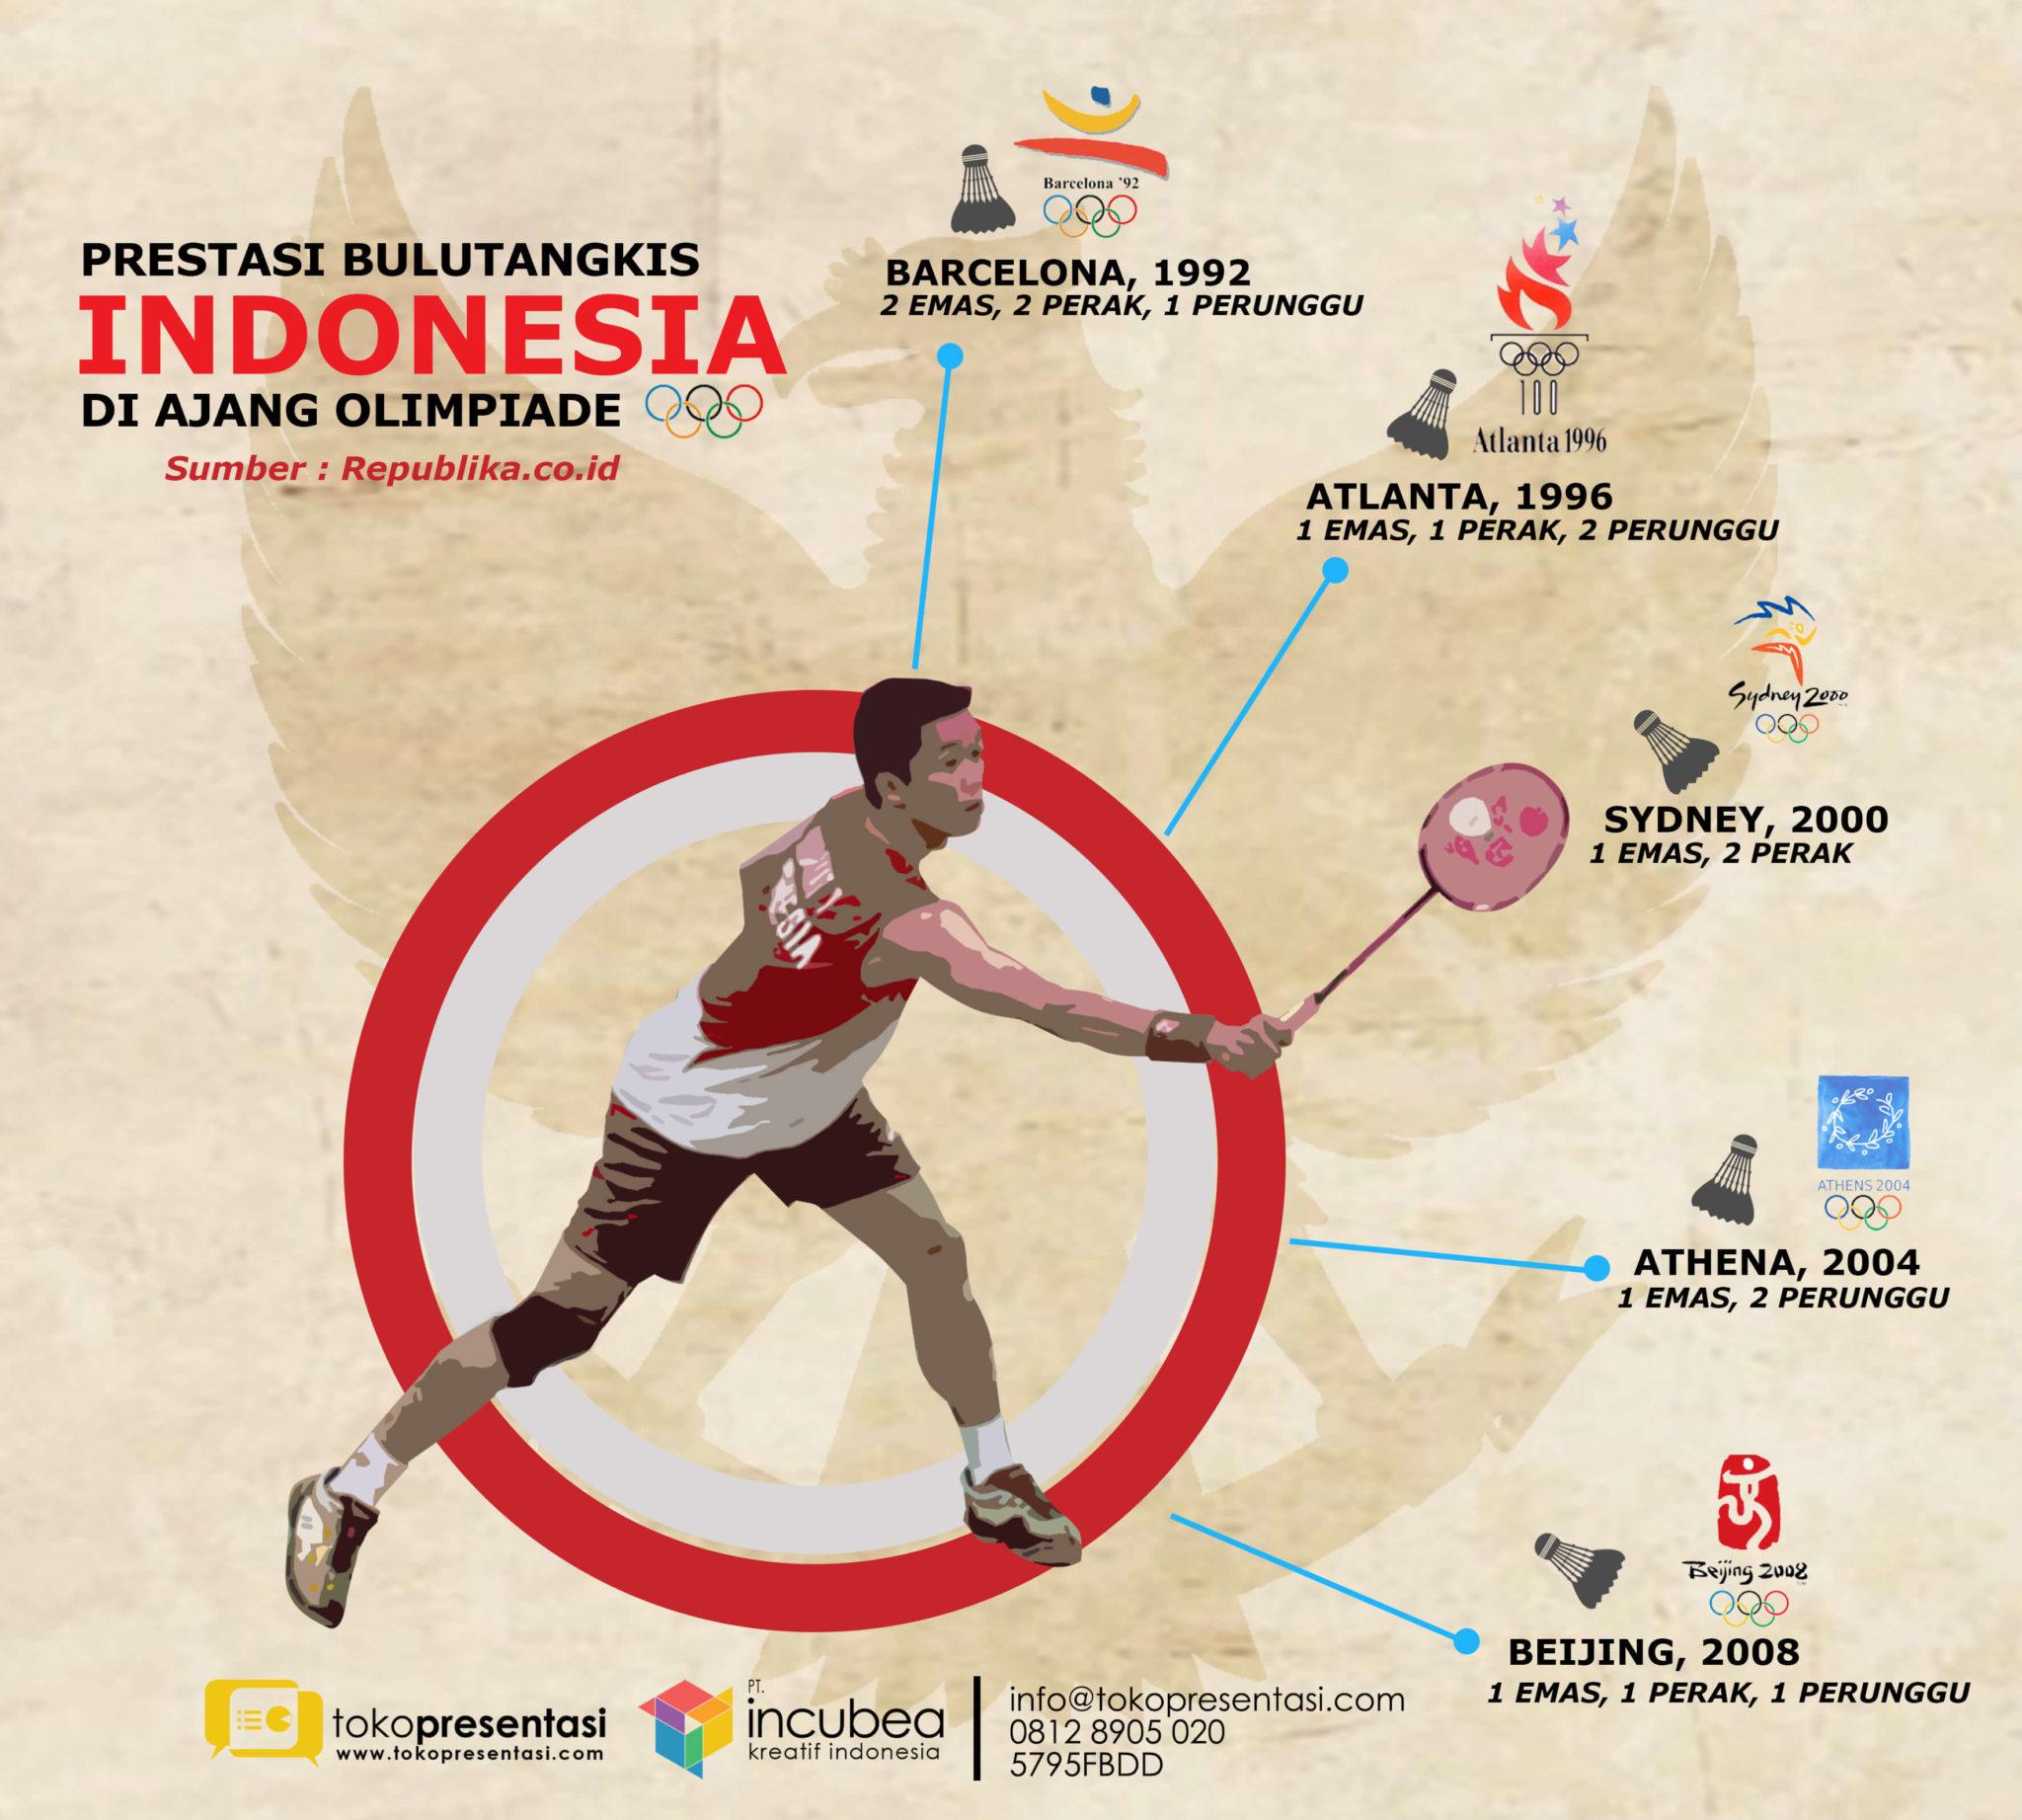 infografis prestasi bulutangkis indonesia tokopresentasi.com